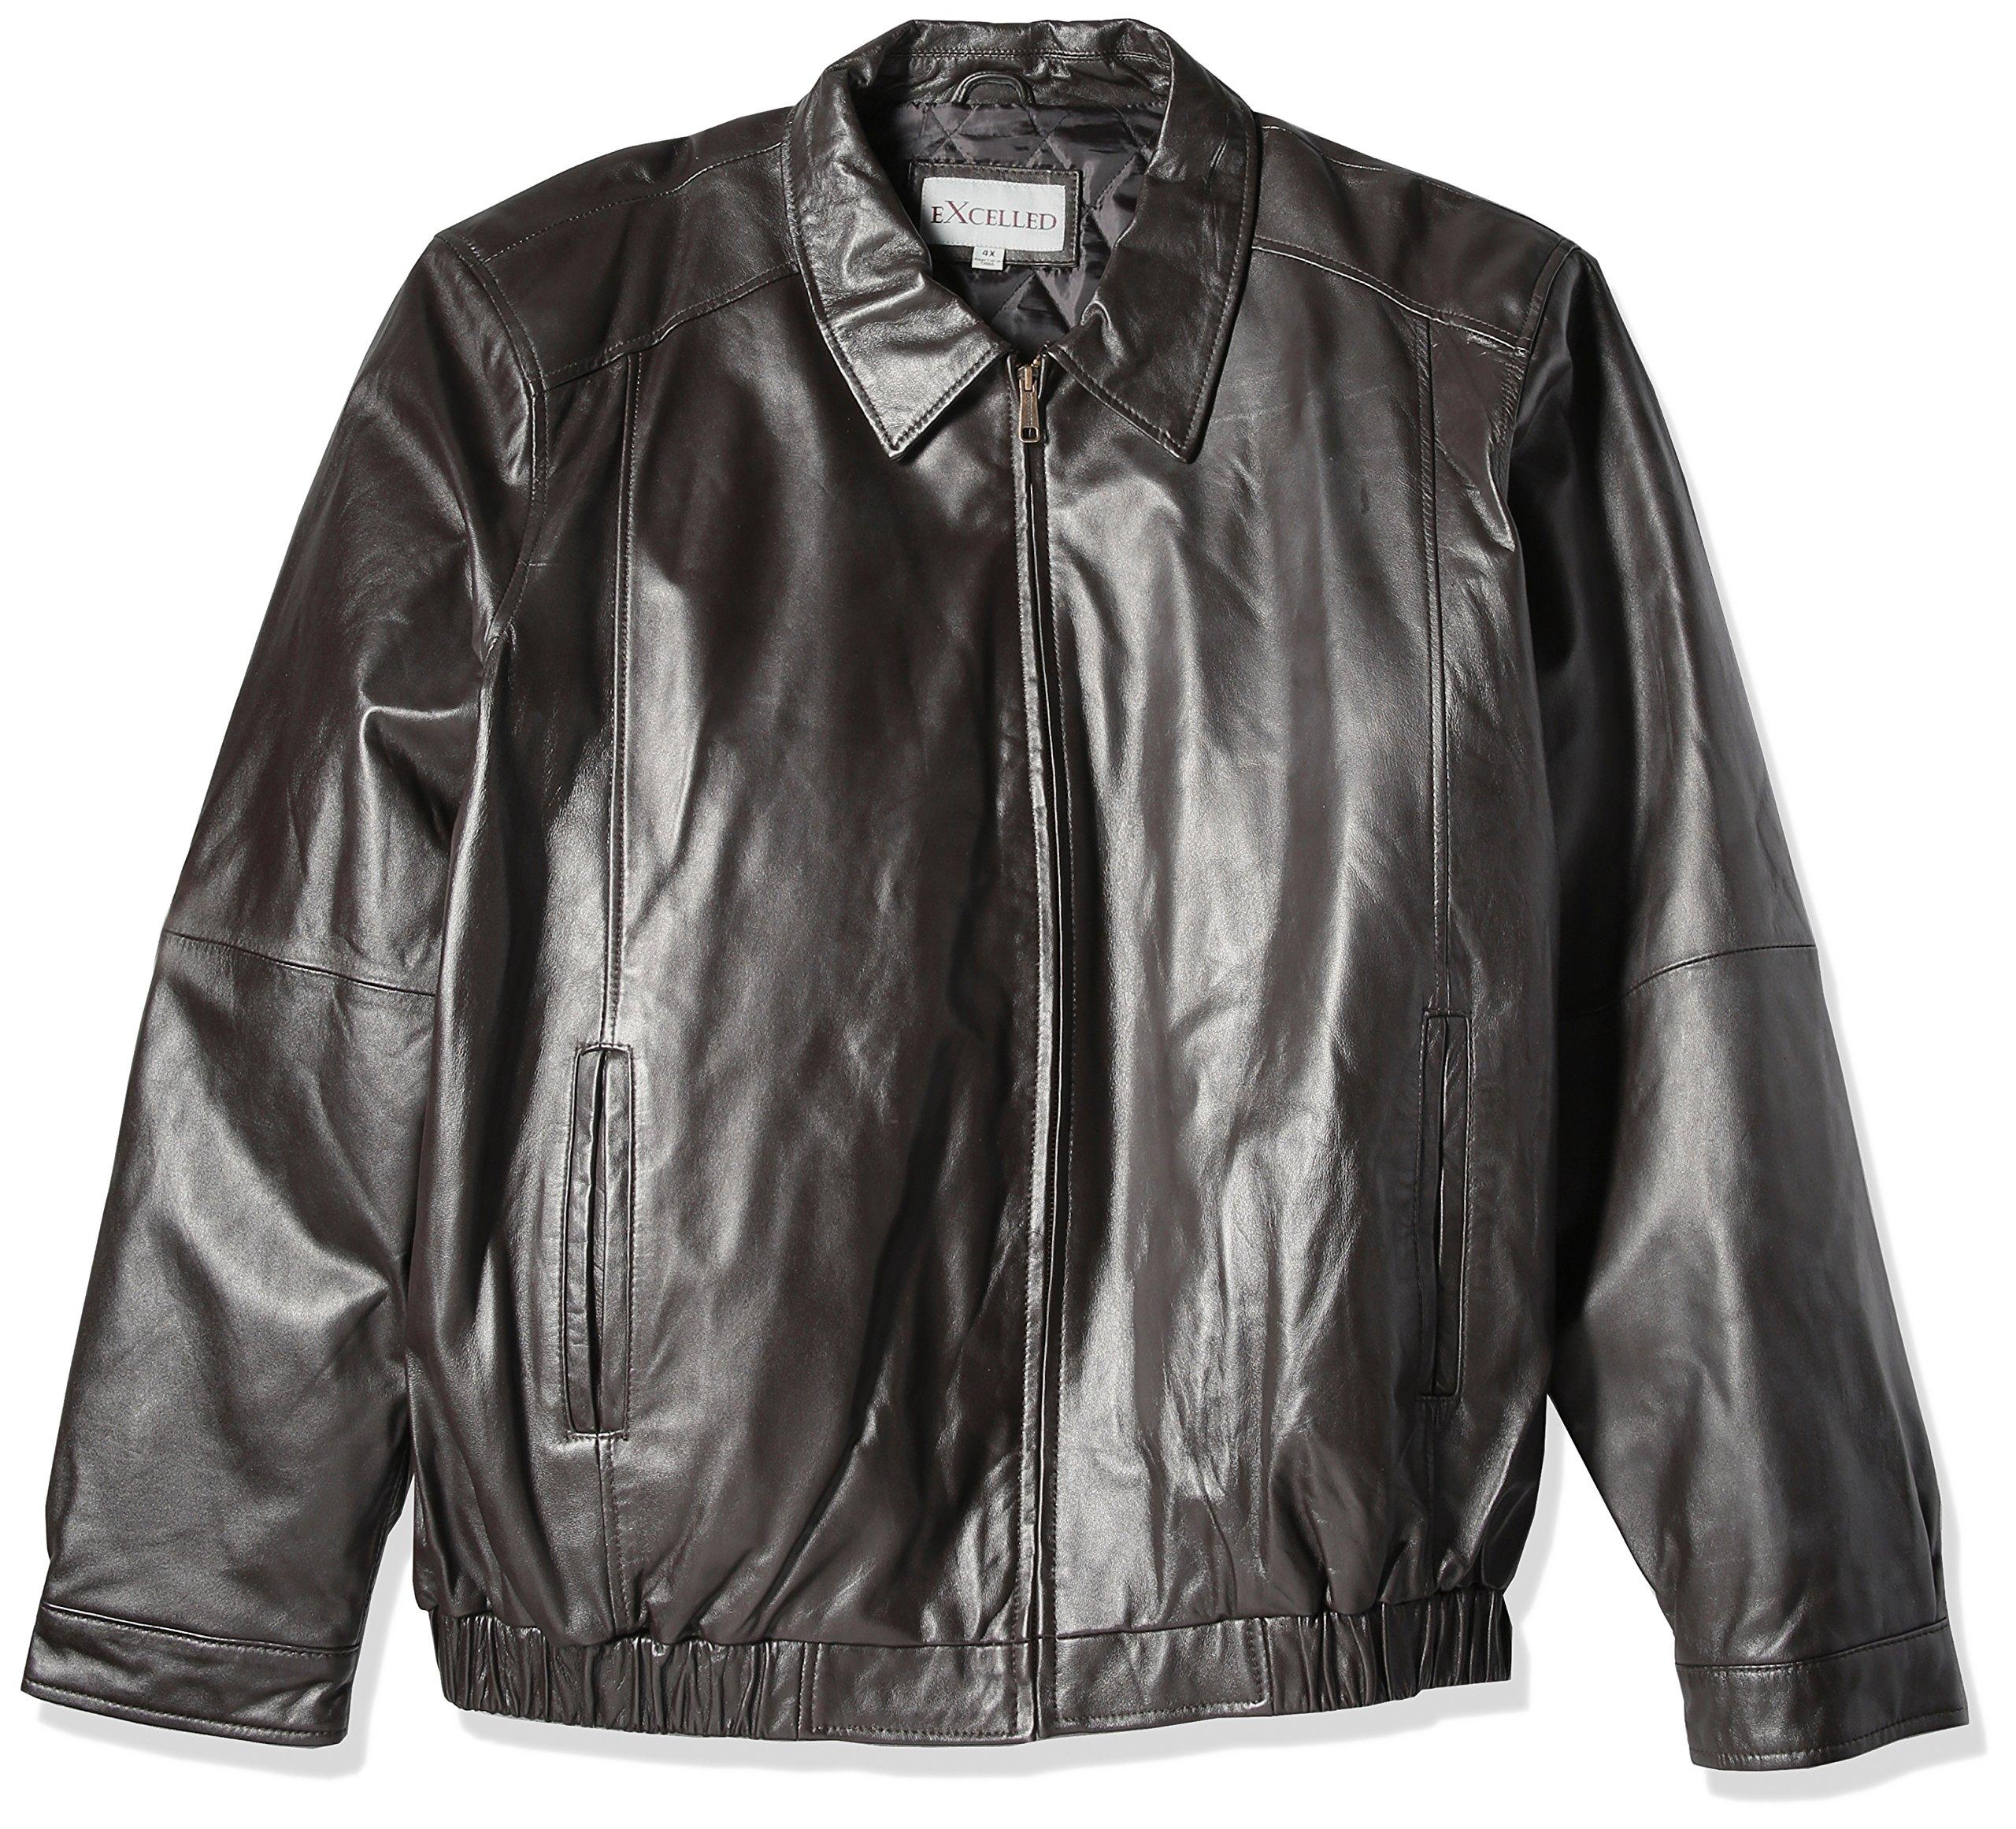 Excelled Men's Big Lambskin Shirt Collar Bomber Jacket, Brown, X-Large Tall